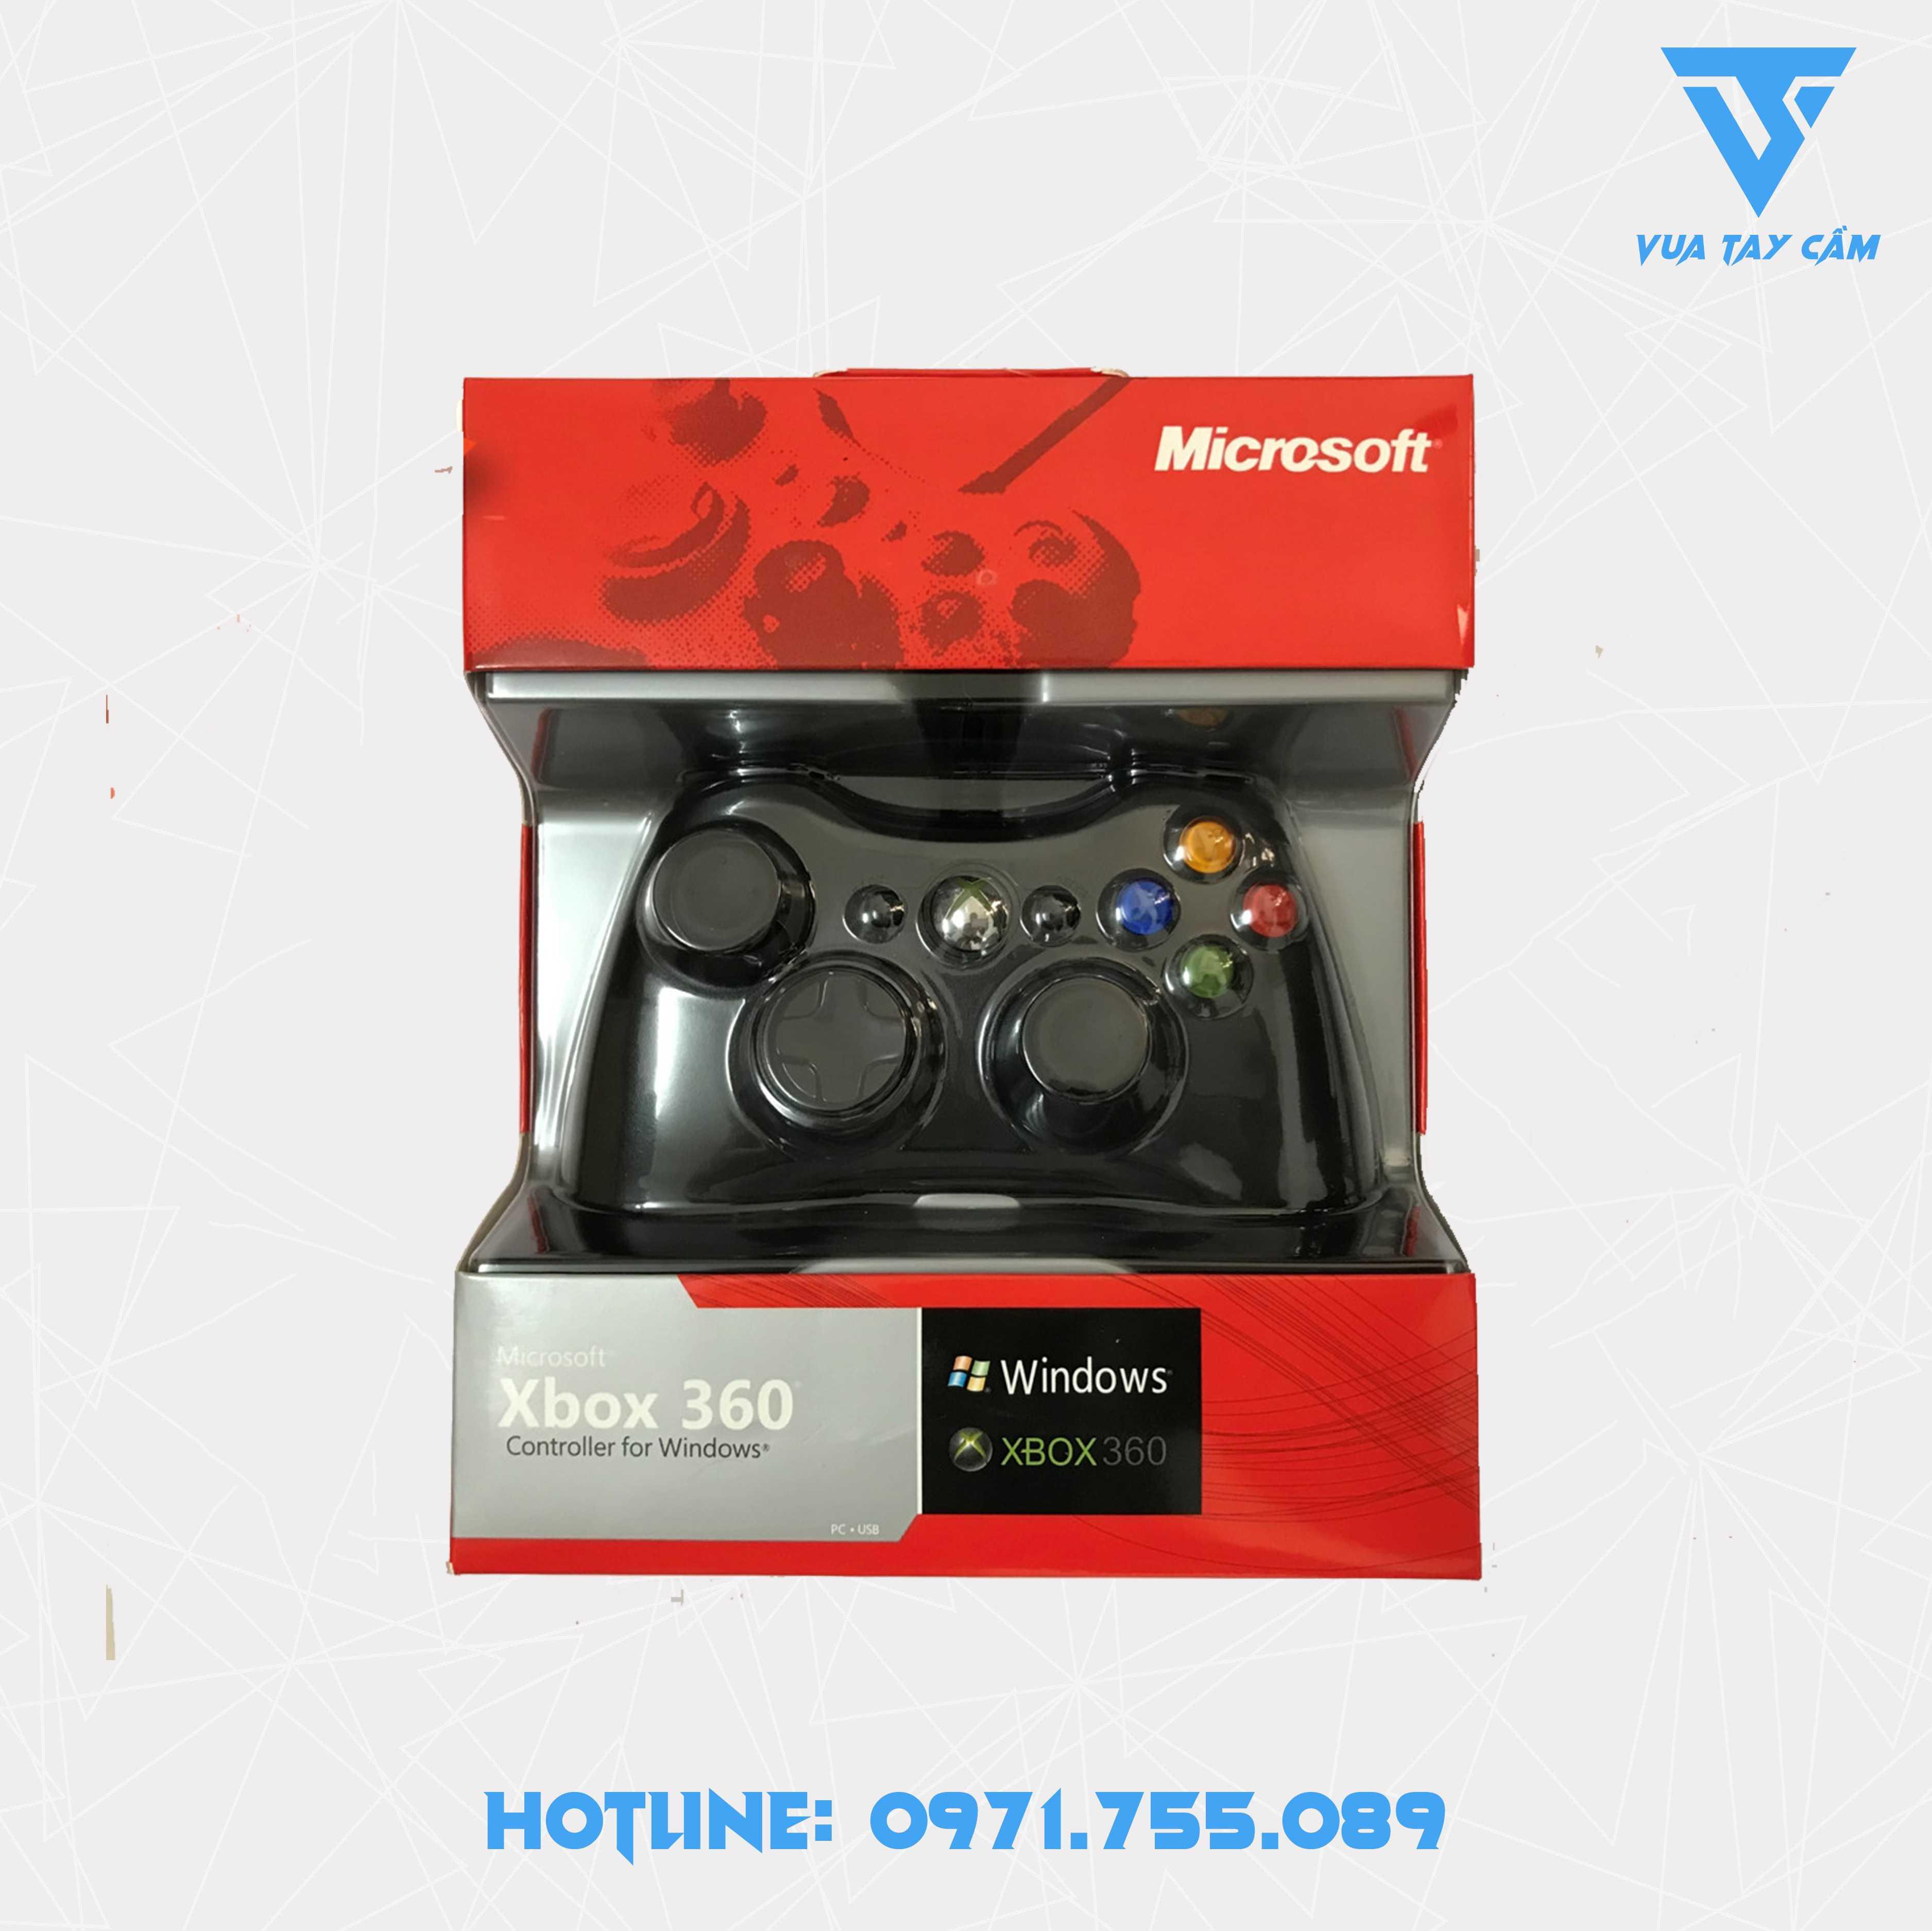 https://api.vuataycam.com/file/1602345182468-916545441-tay-cam-choi-game-xbox-360-zin.jpg